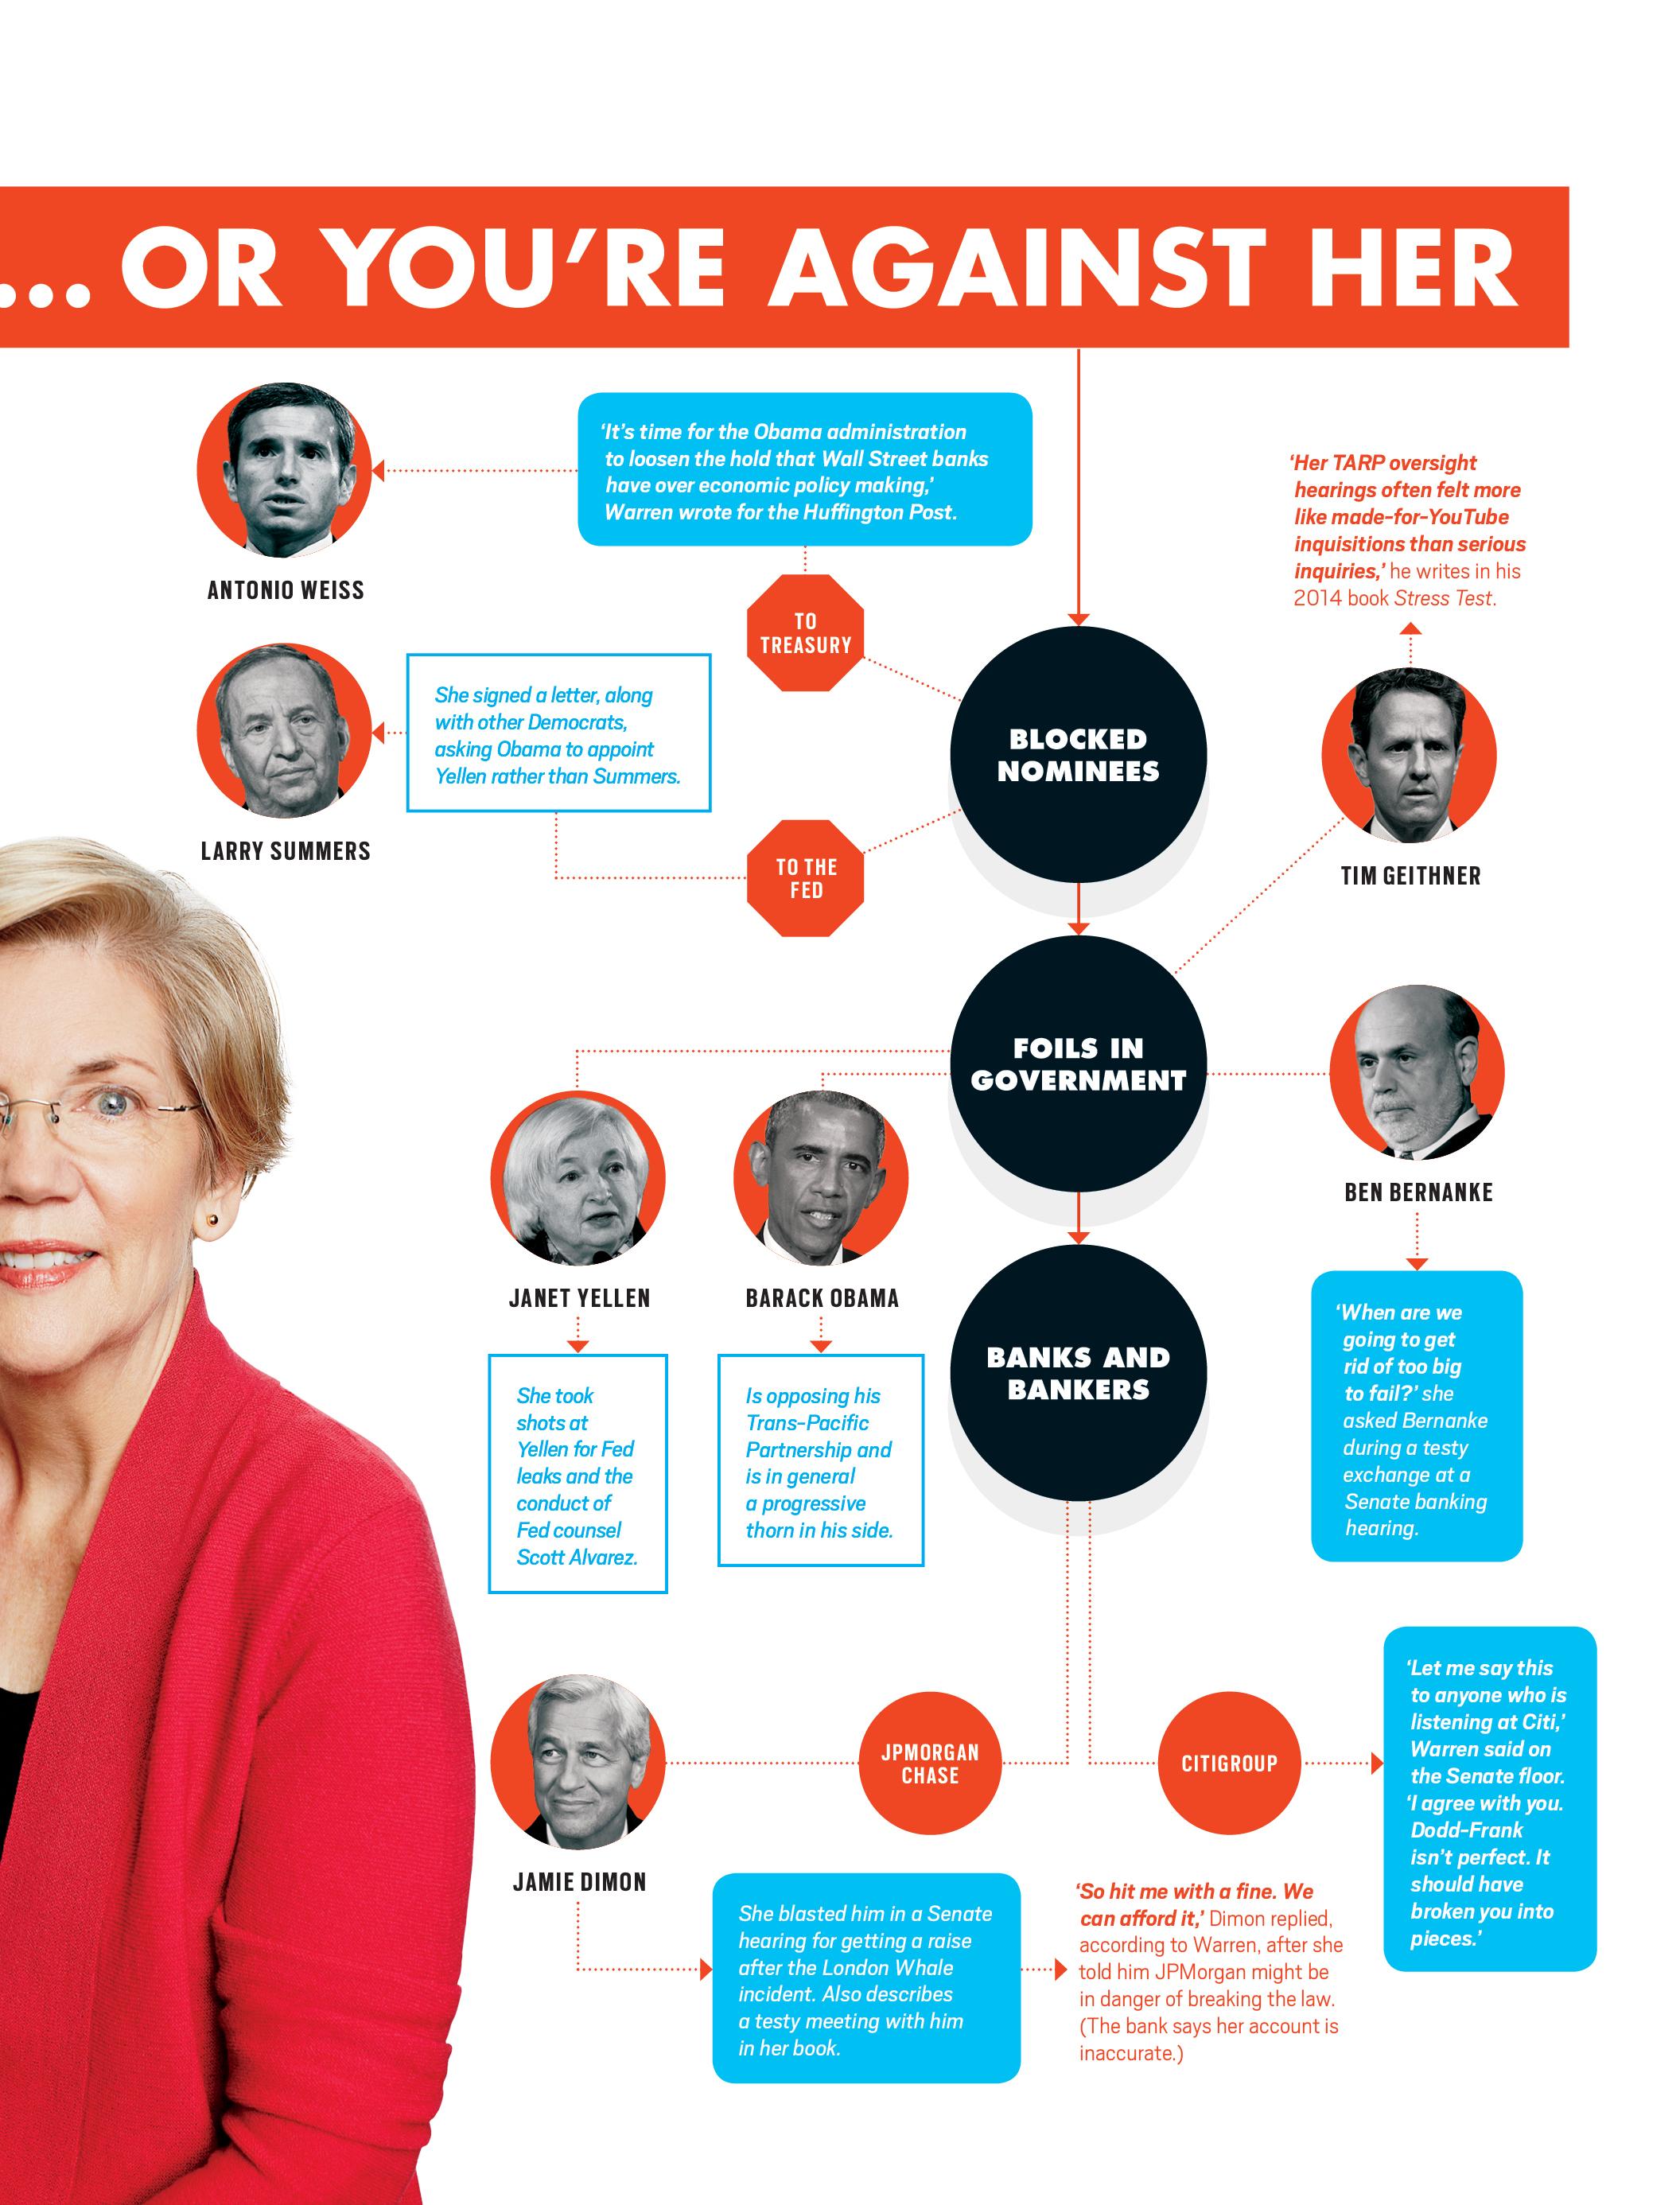 Those against Warren